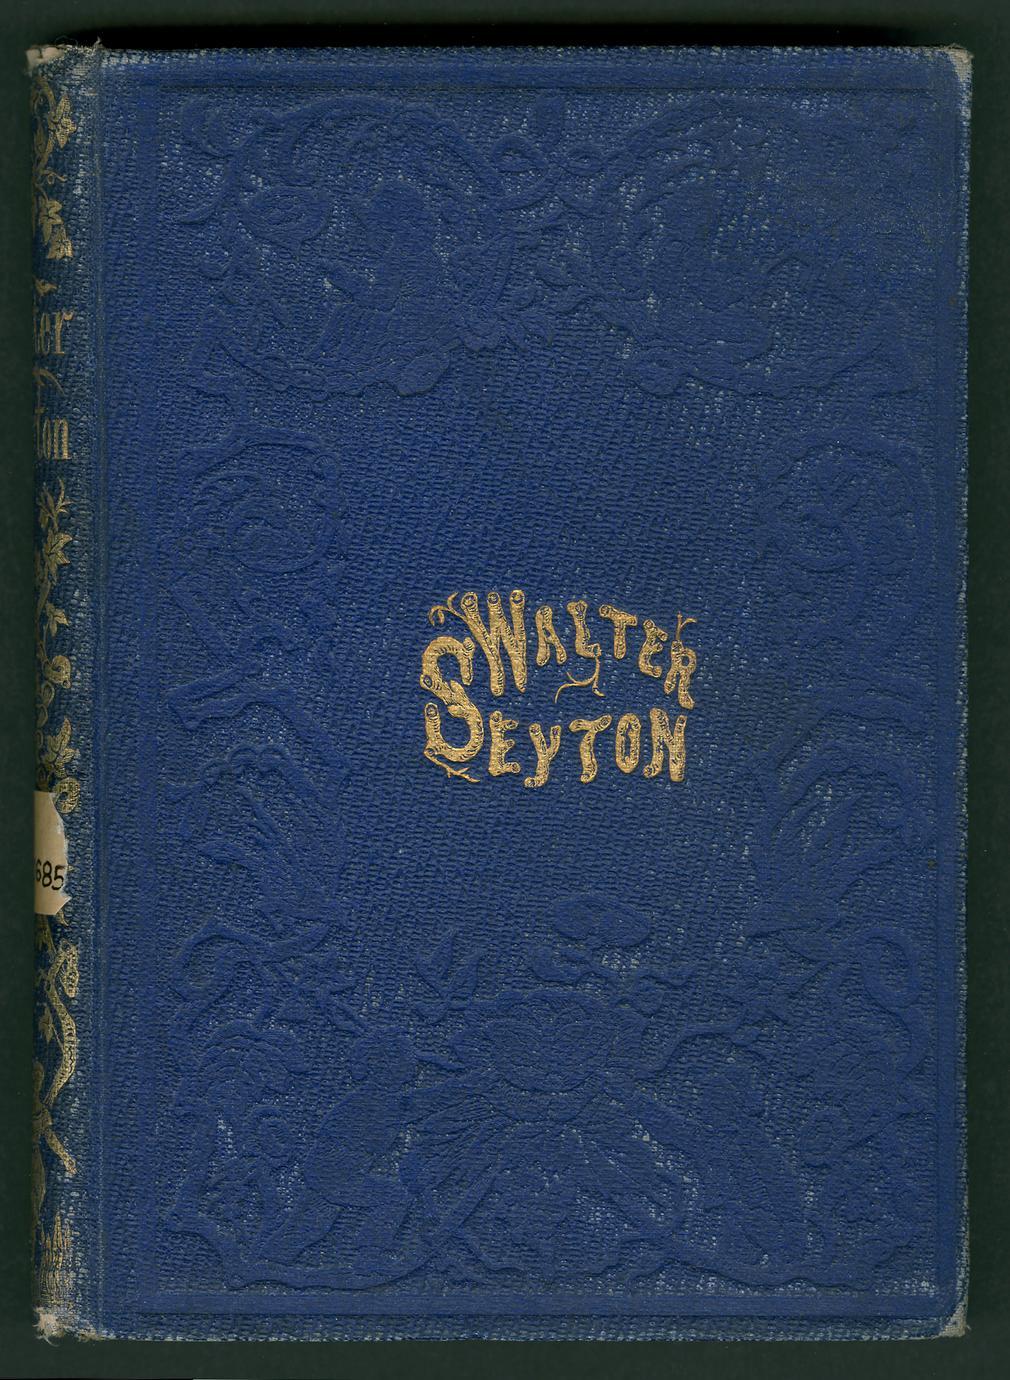 Walter Seyton : a story of rural life in Virginia (1 of 3)